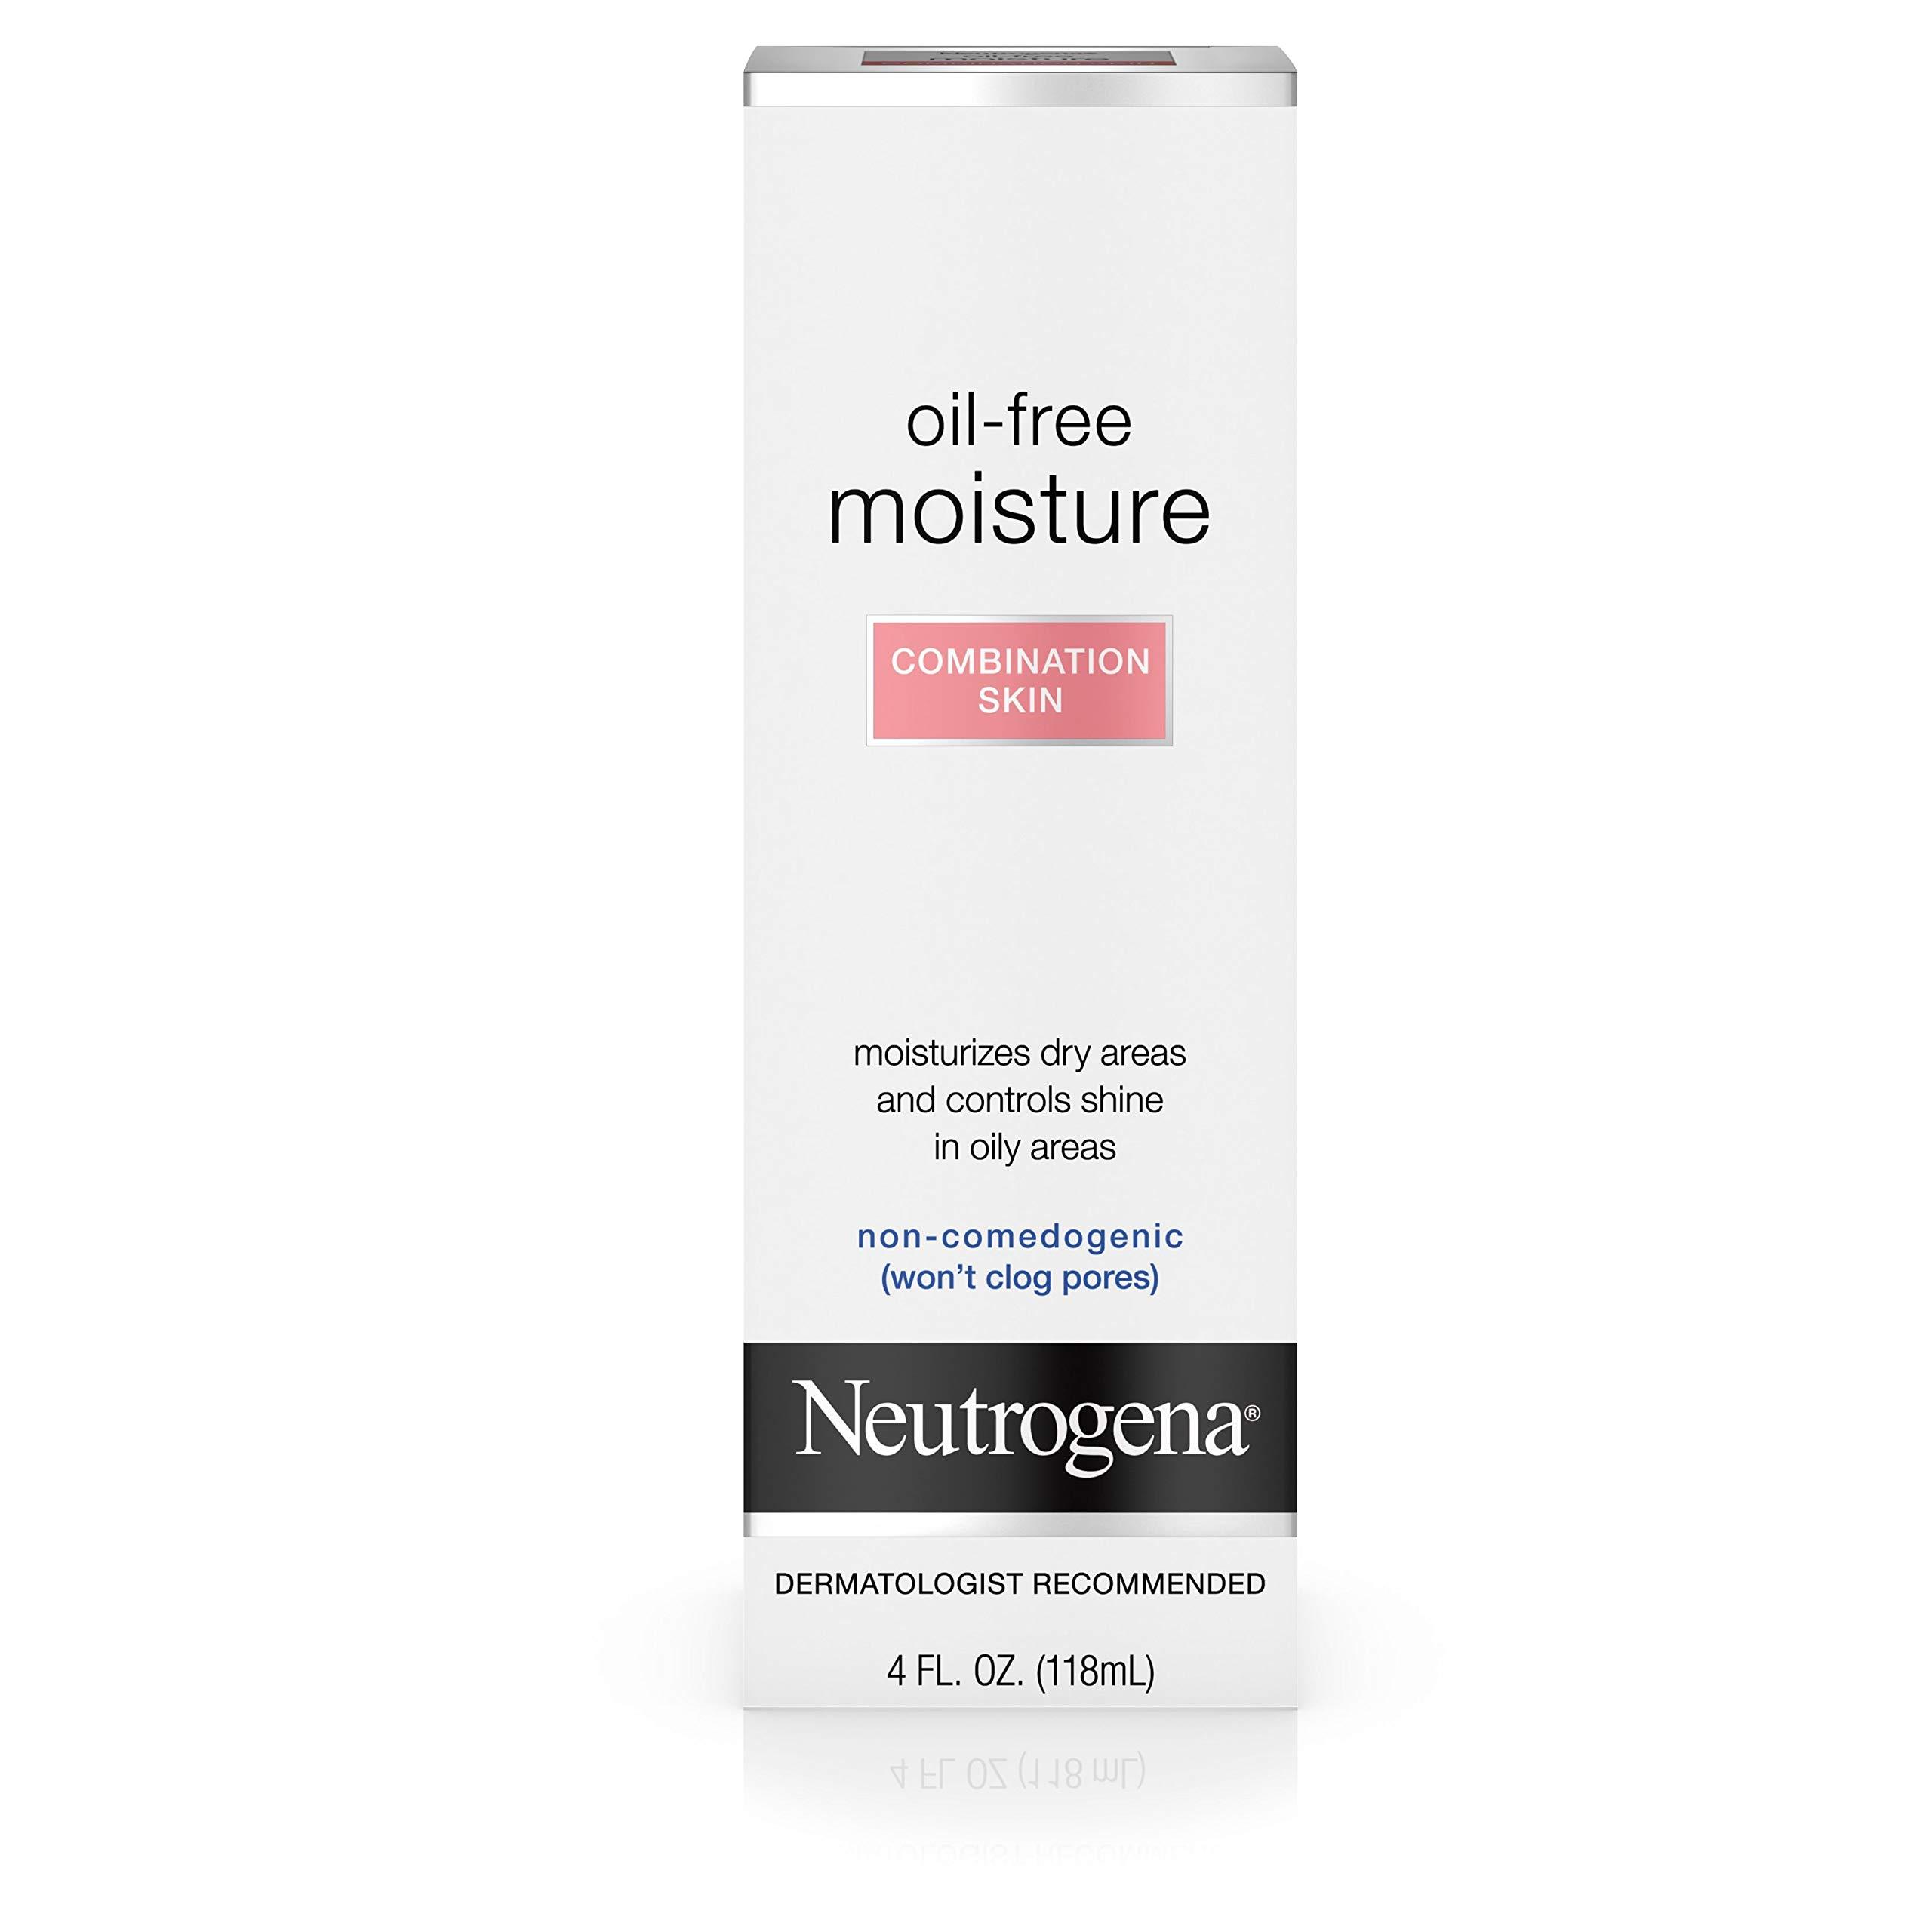 Neutrogena Oil Free Moisture Glycerin Face Moisturizer & Neck Cream Derived from Castor Oil, Lightweight, Oil Absorbing, Soft Natural Matte Finish Facial Moisturizer Lotion, 4 fl. oz